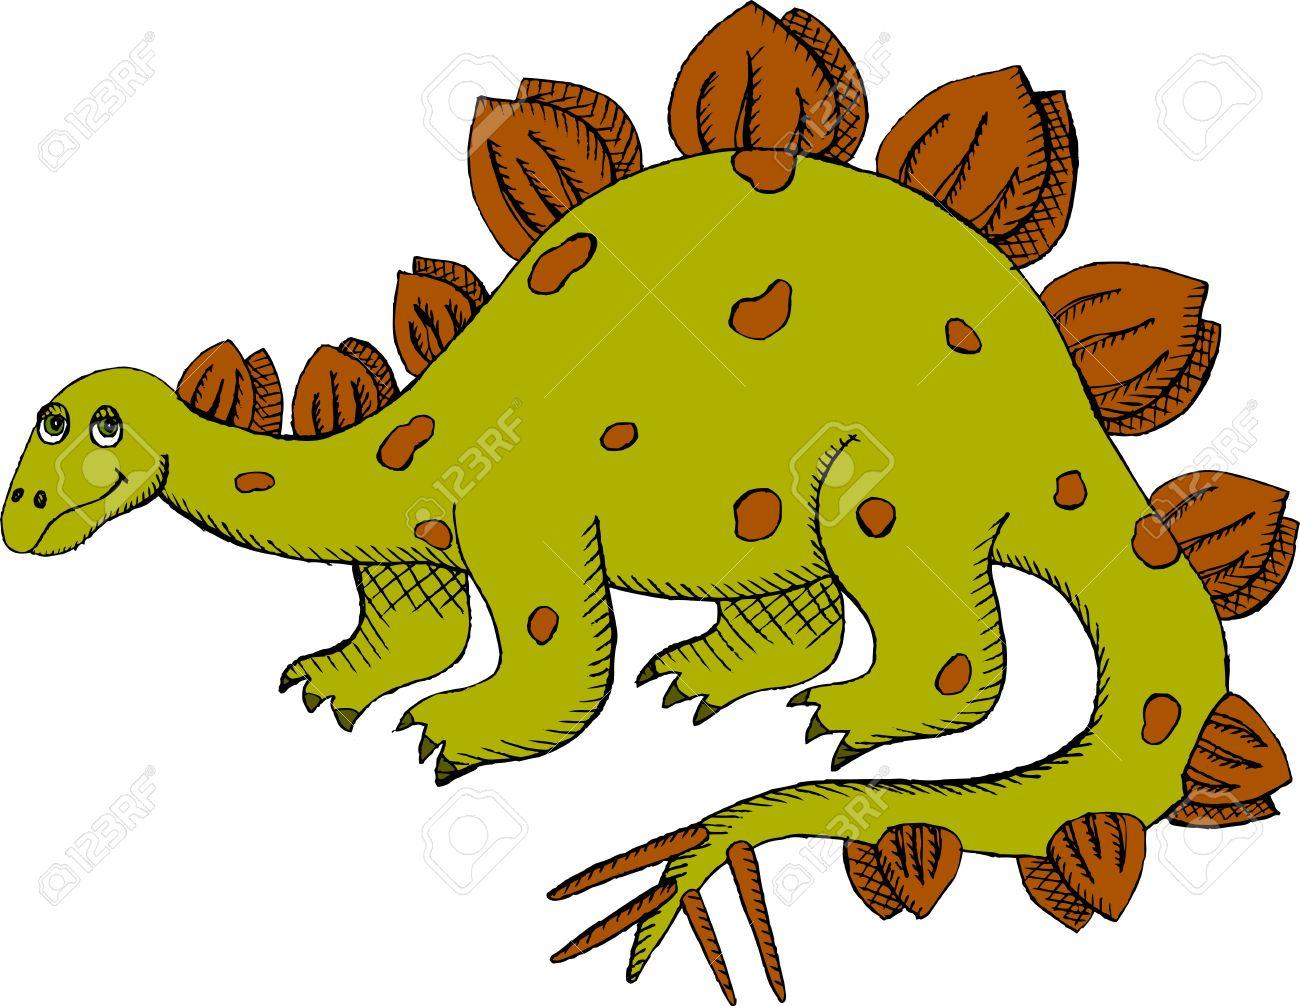 Clipart Stegosaurus.